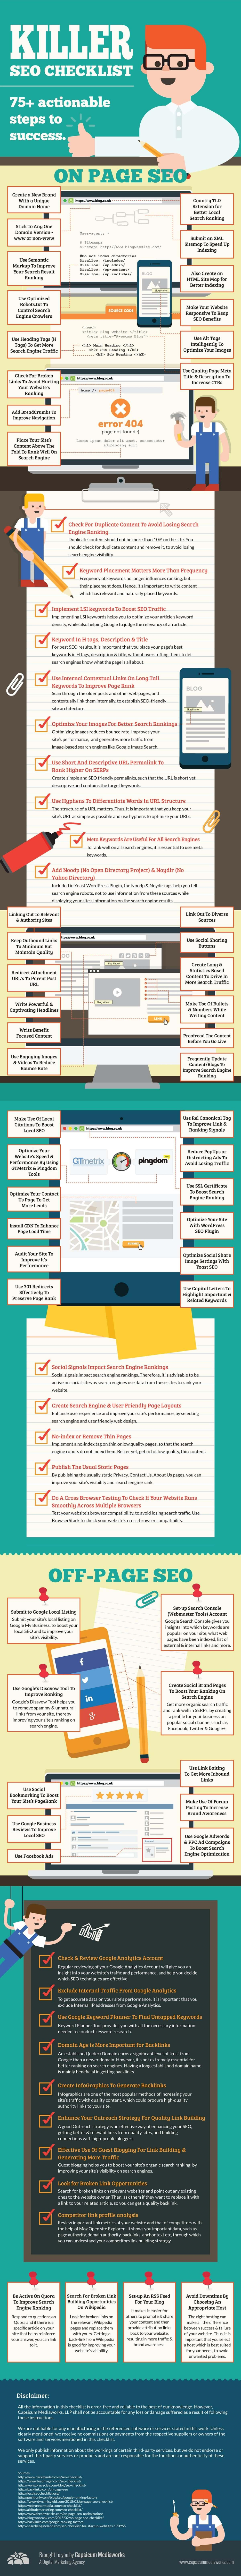 seo-checklist-Infographic